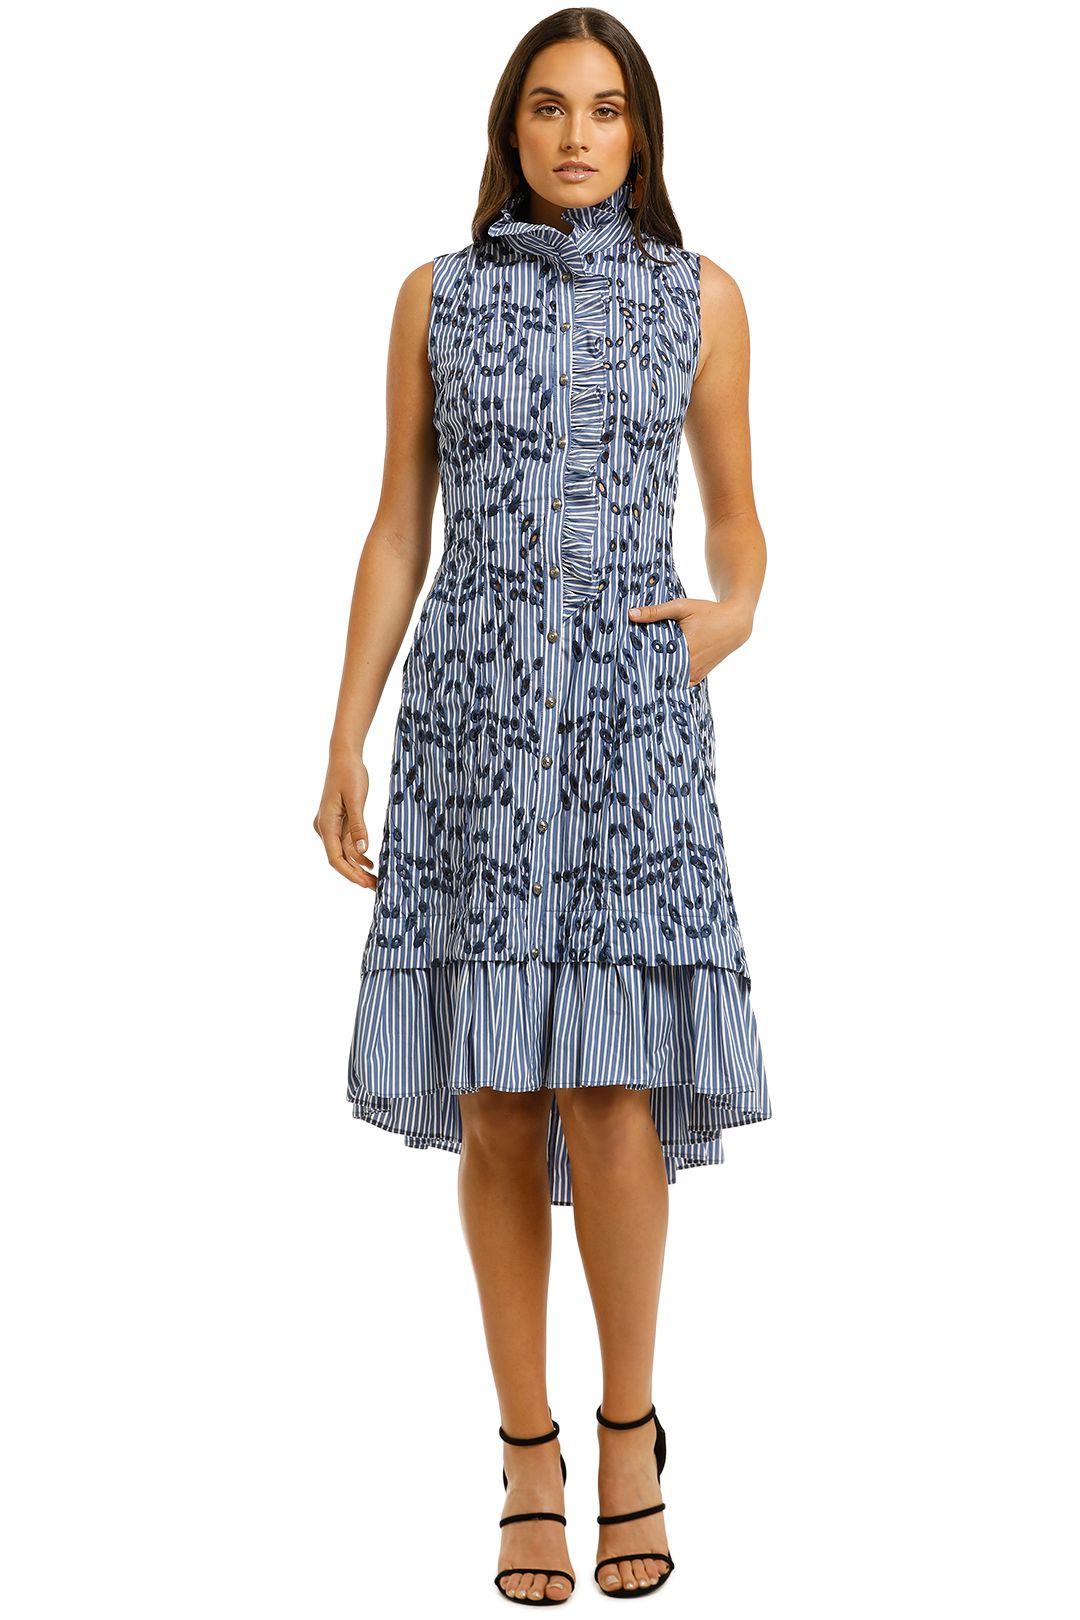 Moss-and-Spy-Ibiza-Shirt-Dress-Blue-Stripe-Front